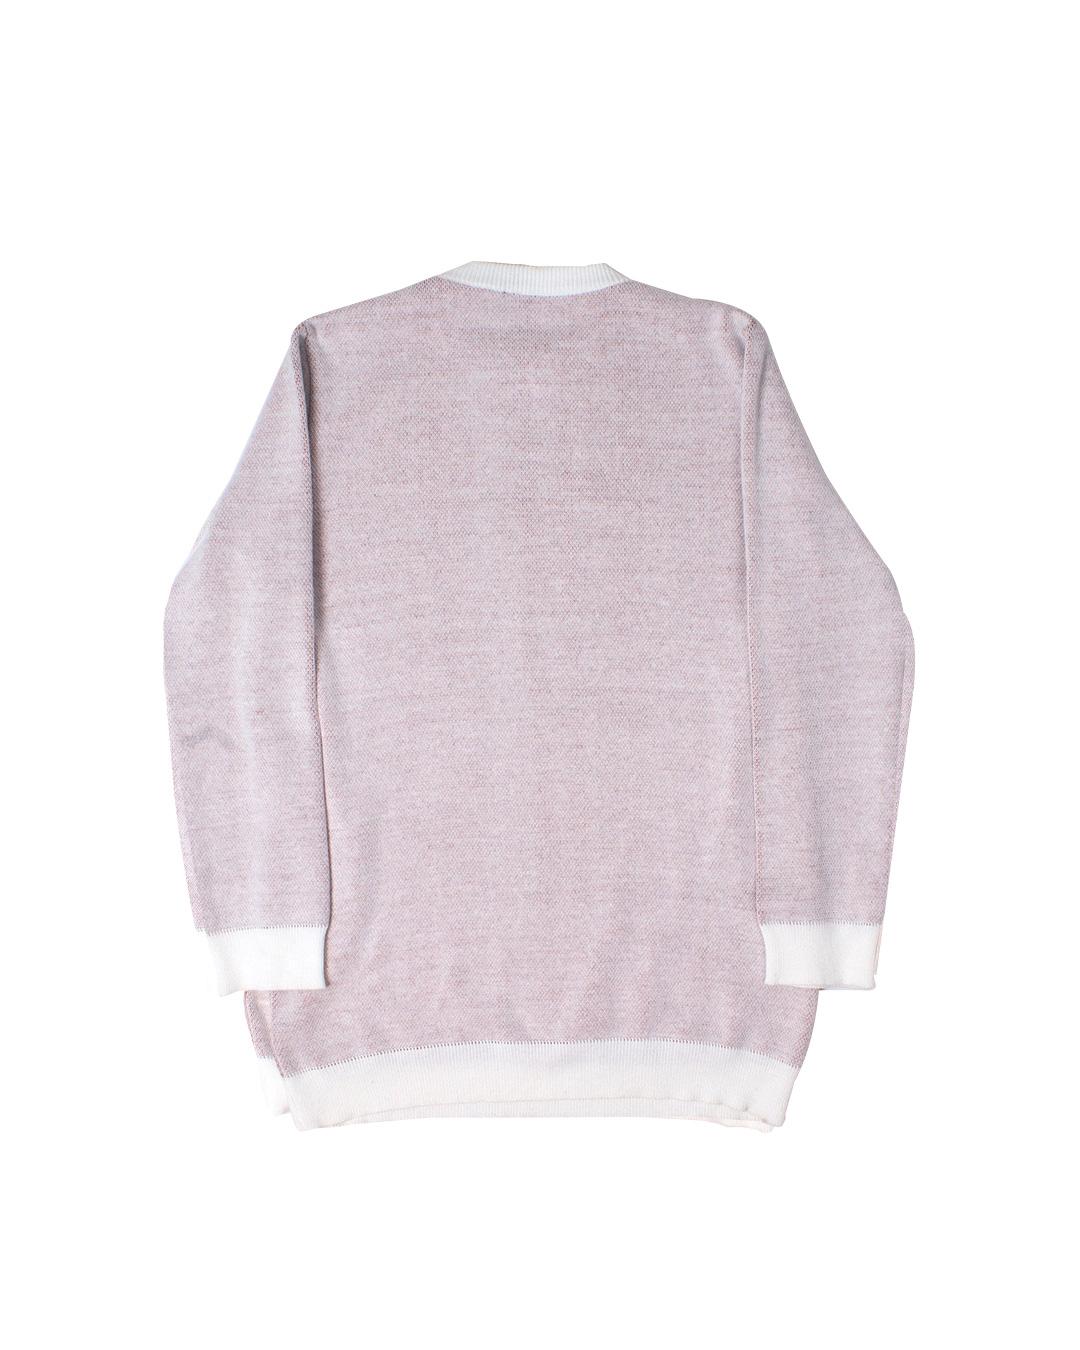 Sweater Fortune Off White Blaze Supply